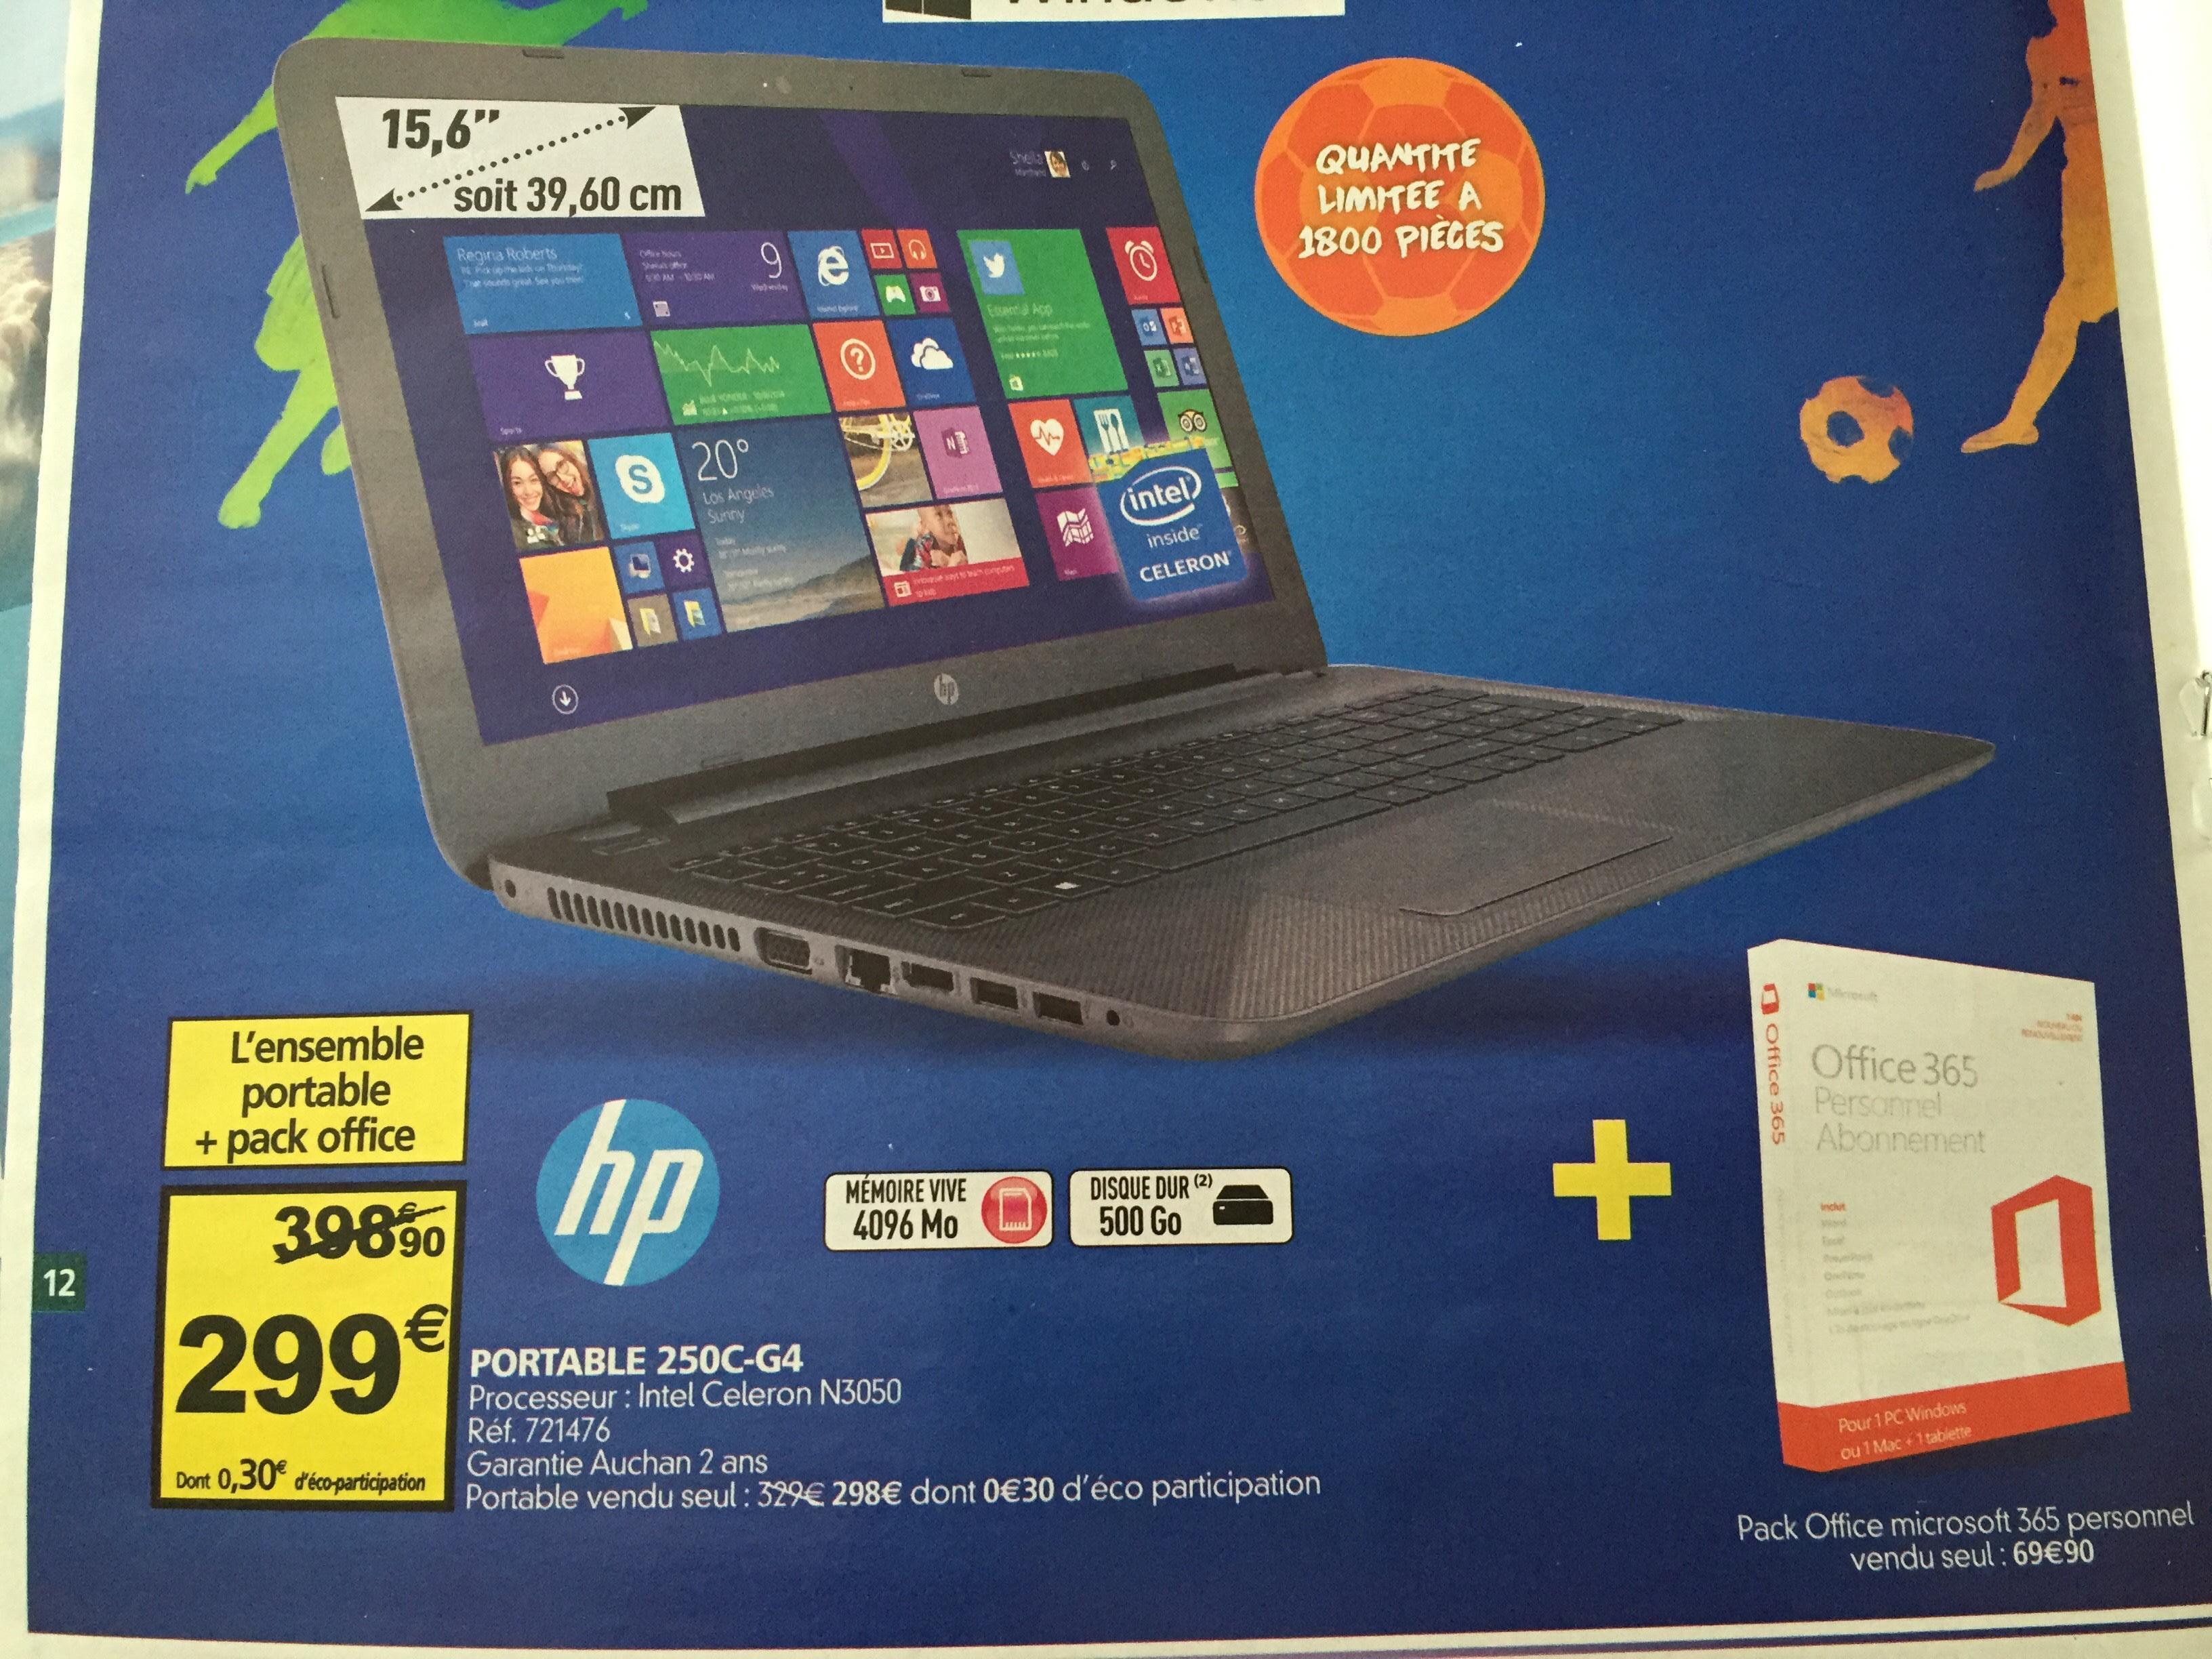 "PC Portable 15.6"" HP 250C-G4 (Intel Celeron N3050, HDD 500 Go) + Pack Office 365"